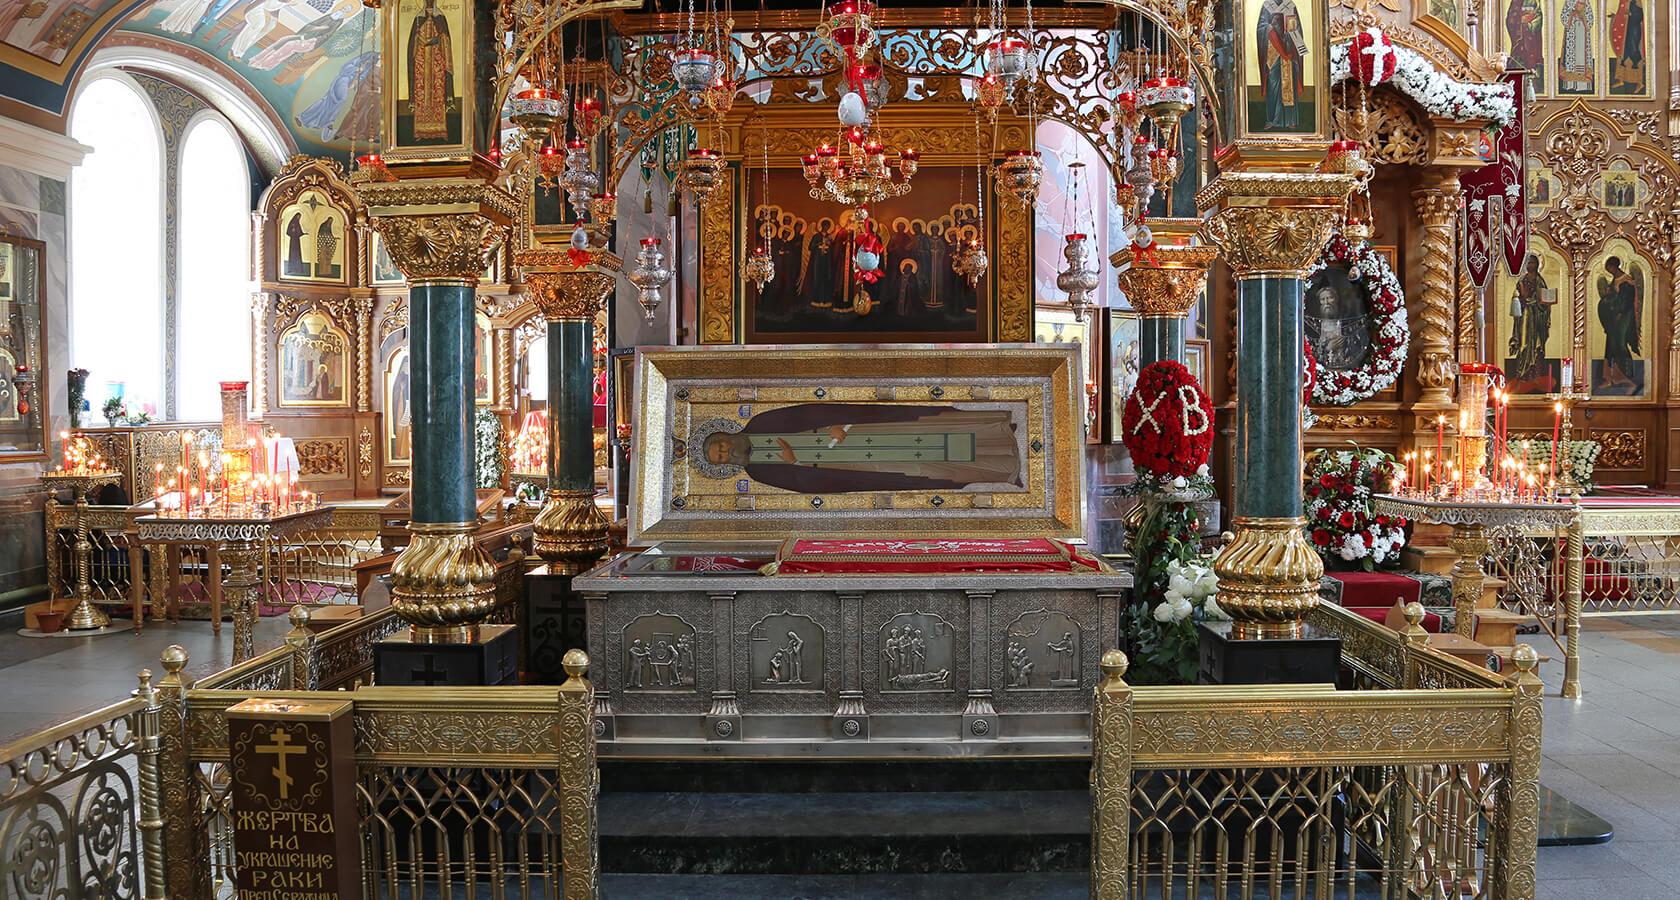 Мощи преподобного Серафима Саровского в Троицком храме в Дивеево